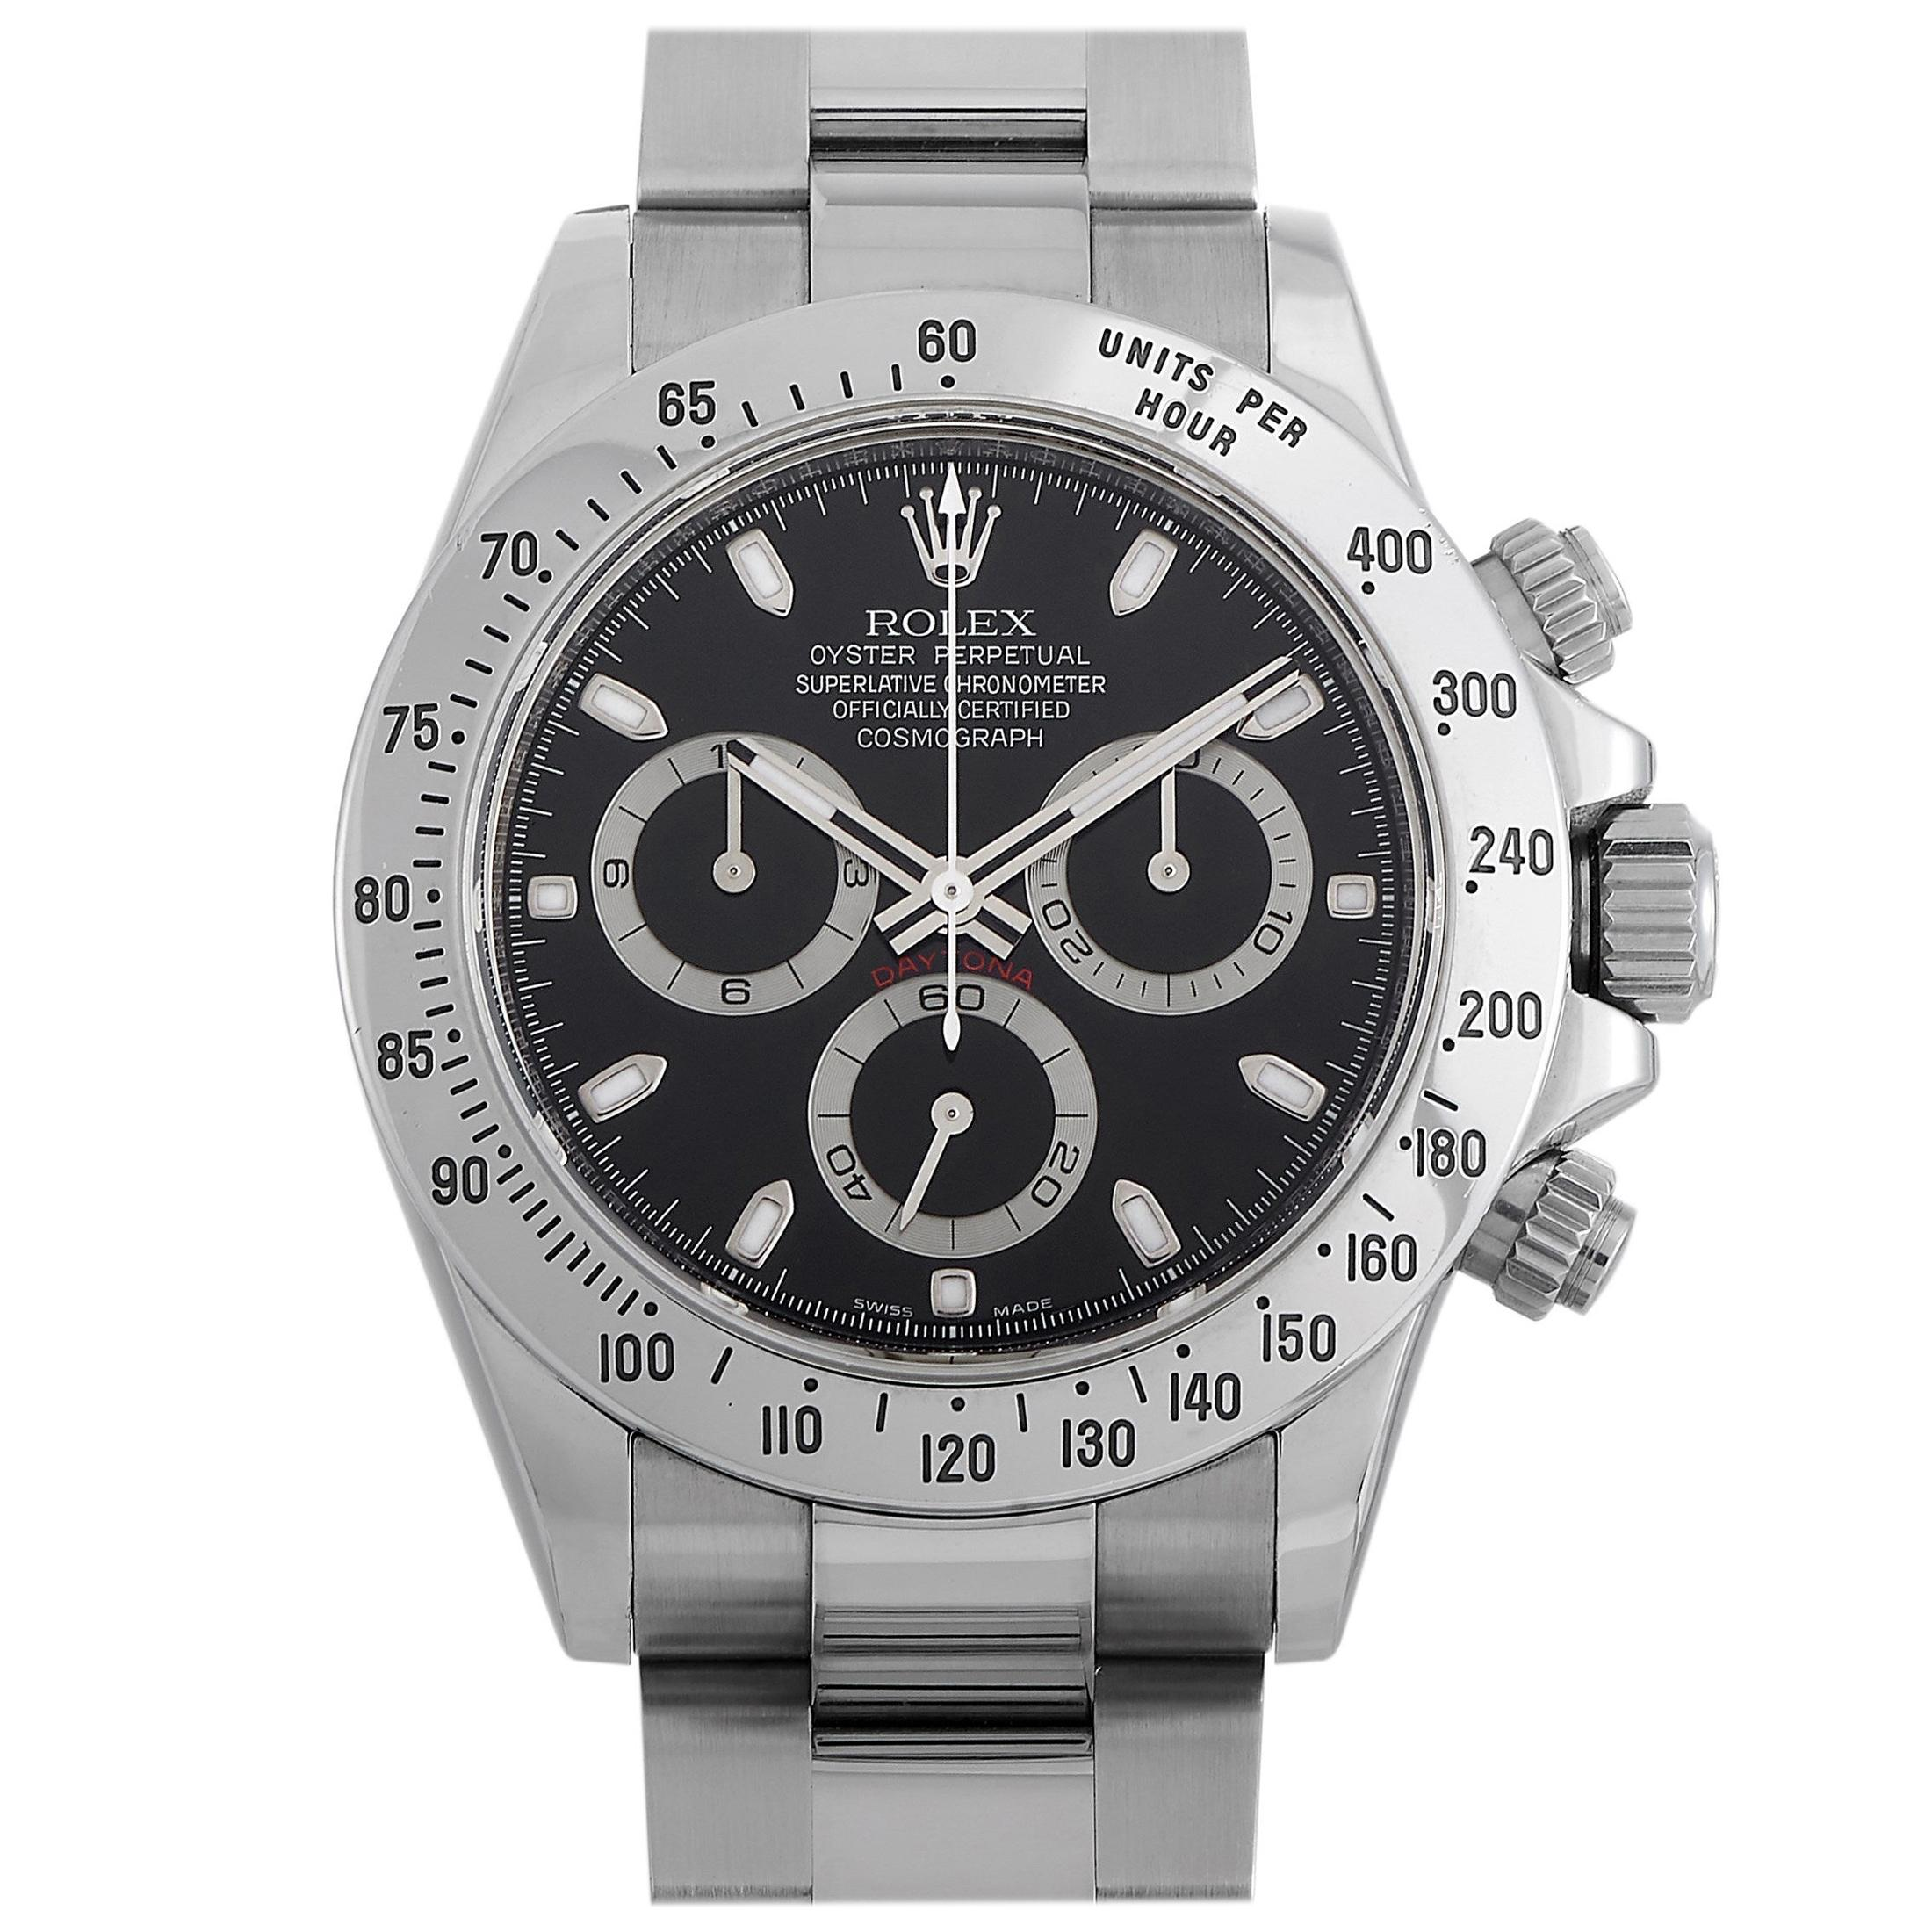 Rolex Cosmograph Daytona Black Stainless Steel Watch 116520